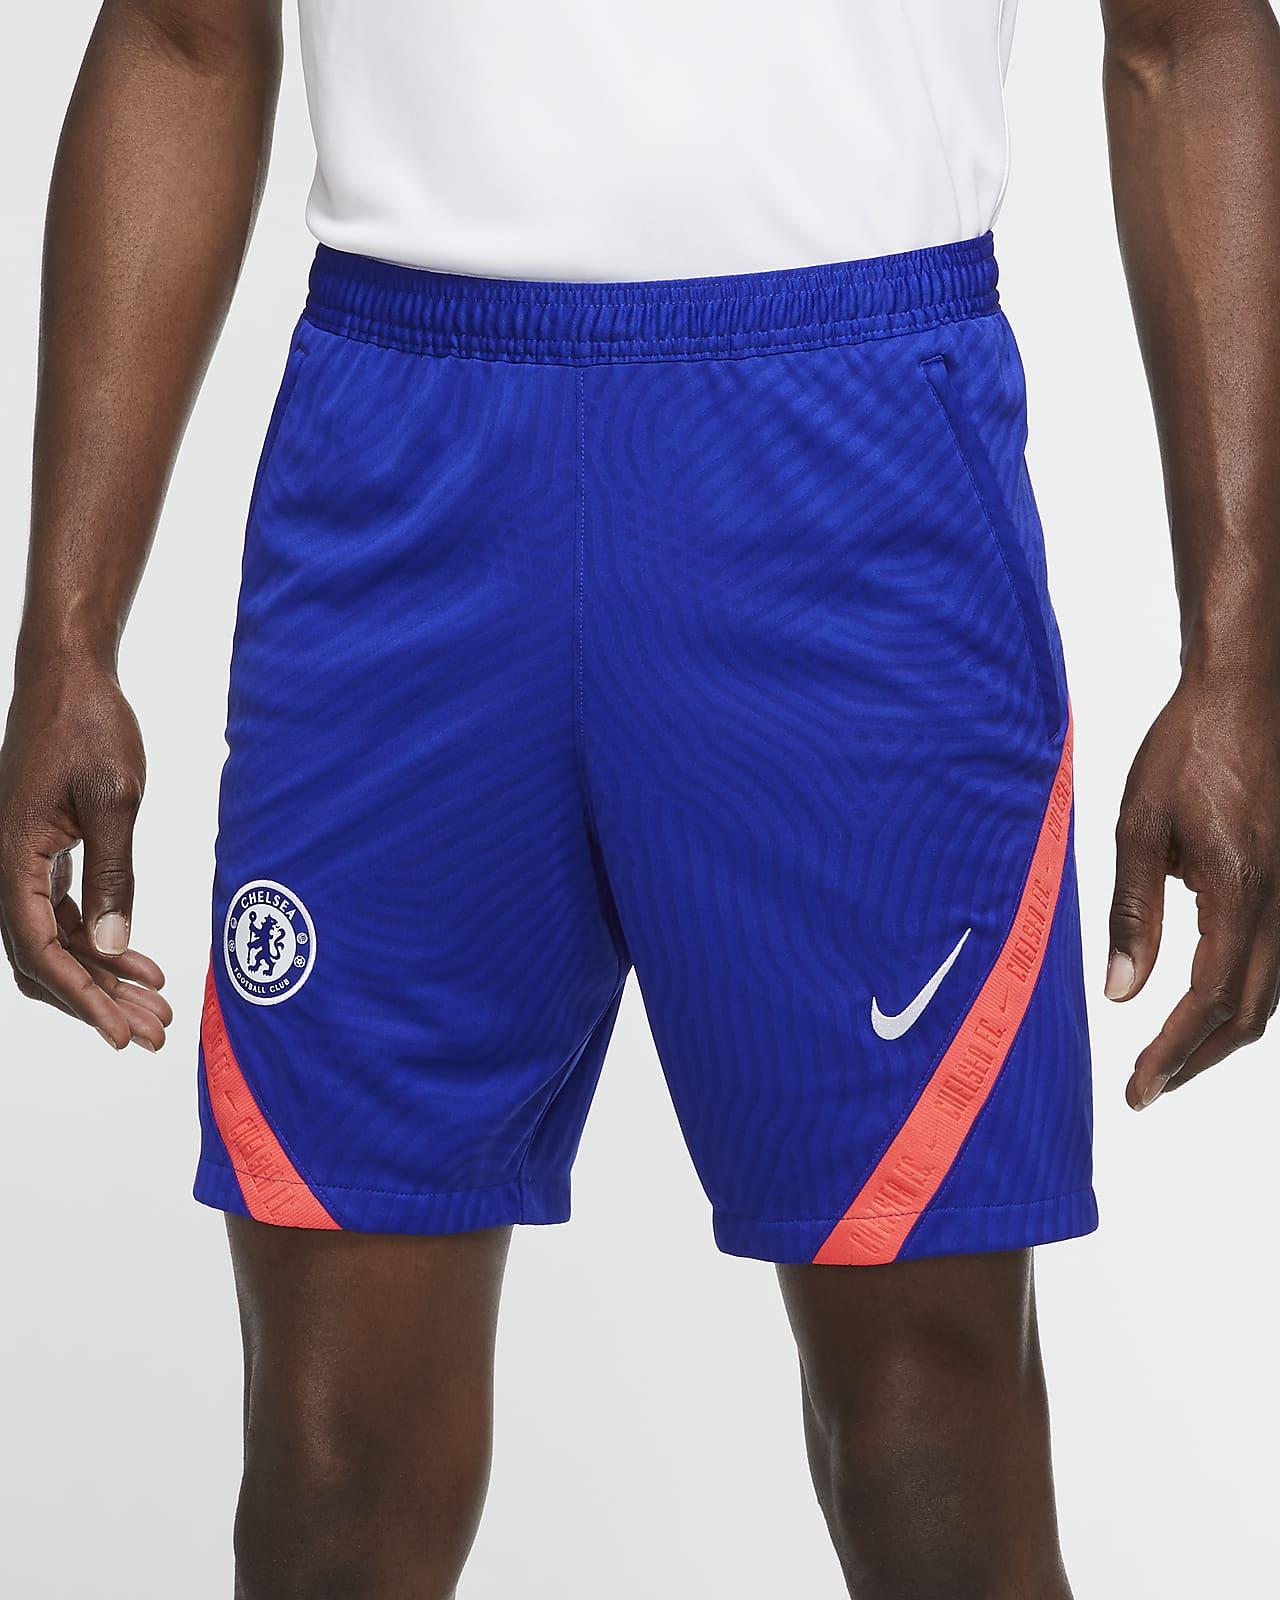 Shorts de fútbol para hombre Chelsea FC Strike